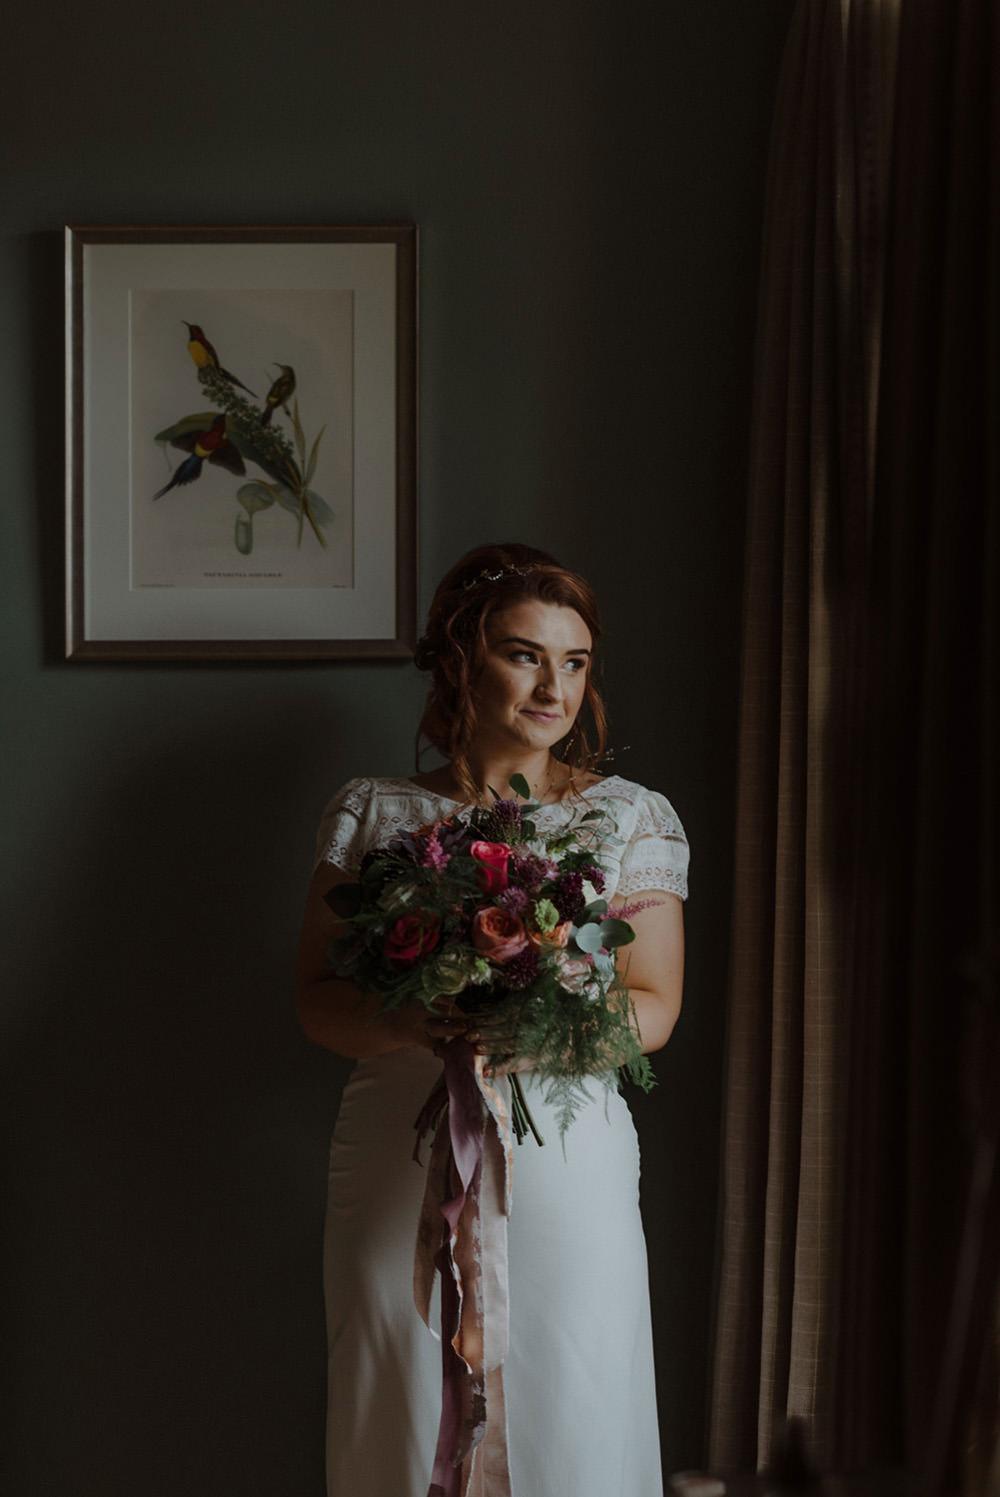 Bride Bridal Bouquet Carnation Peony Pink Greenery Foliage Short Sleeve Slip Dress Felin Newydd House Wedding Christopherian.co.uk